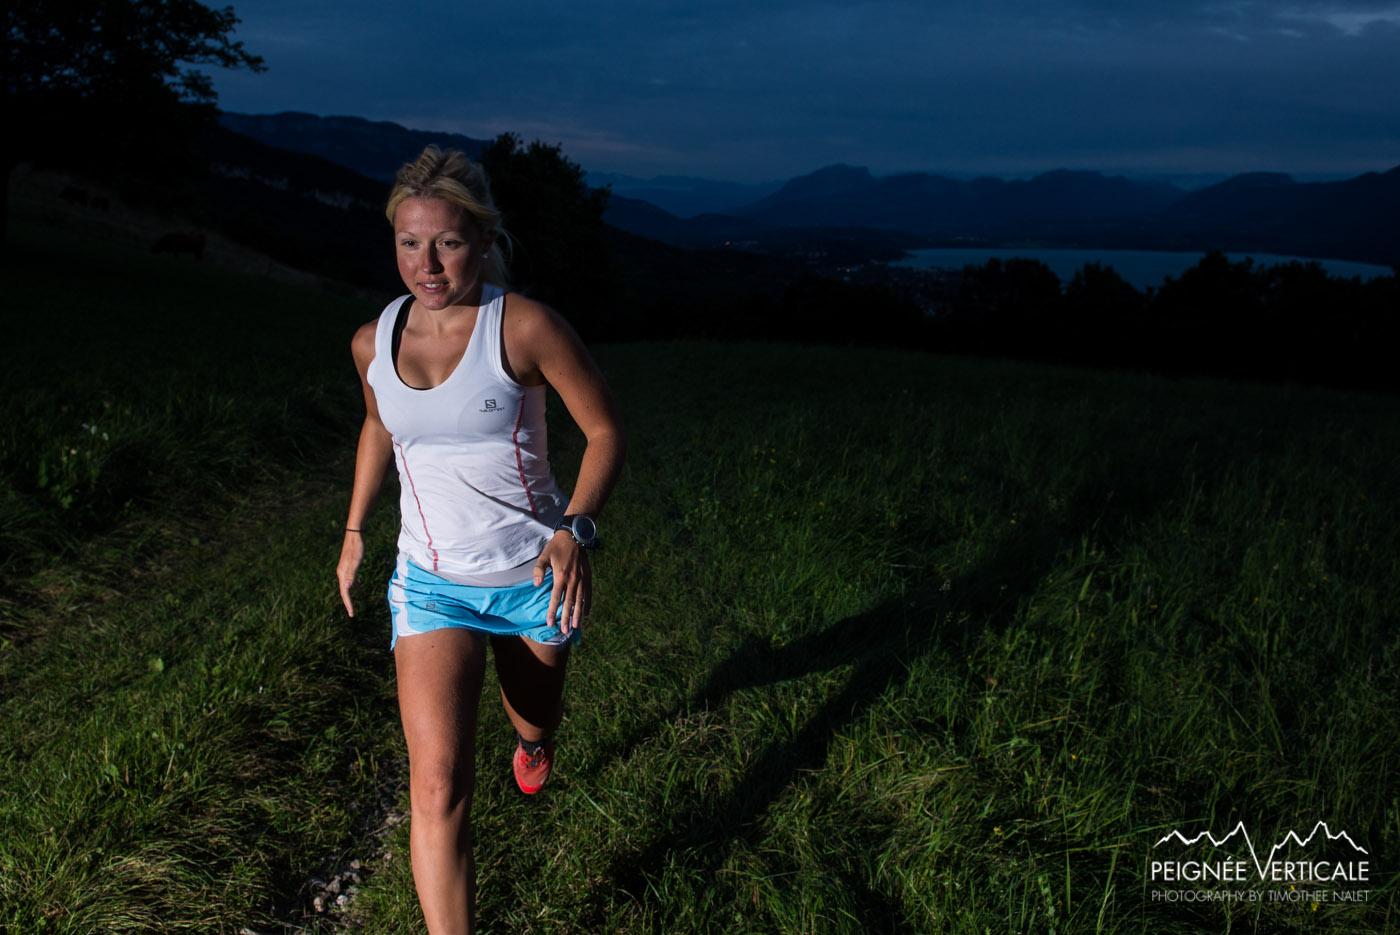 Timothee-Nalet-Laurie-Renoton-Running-night-5564.jpg